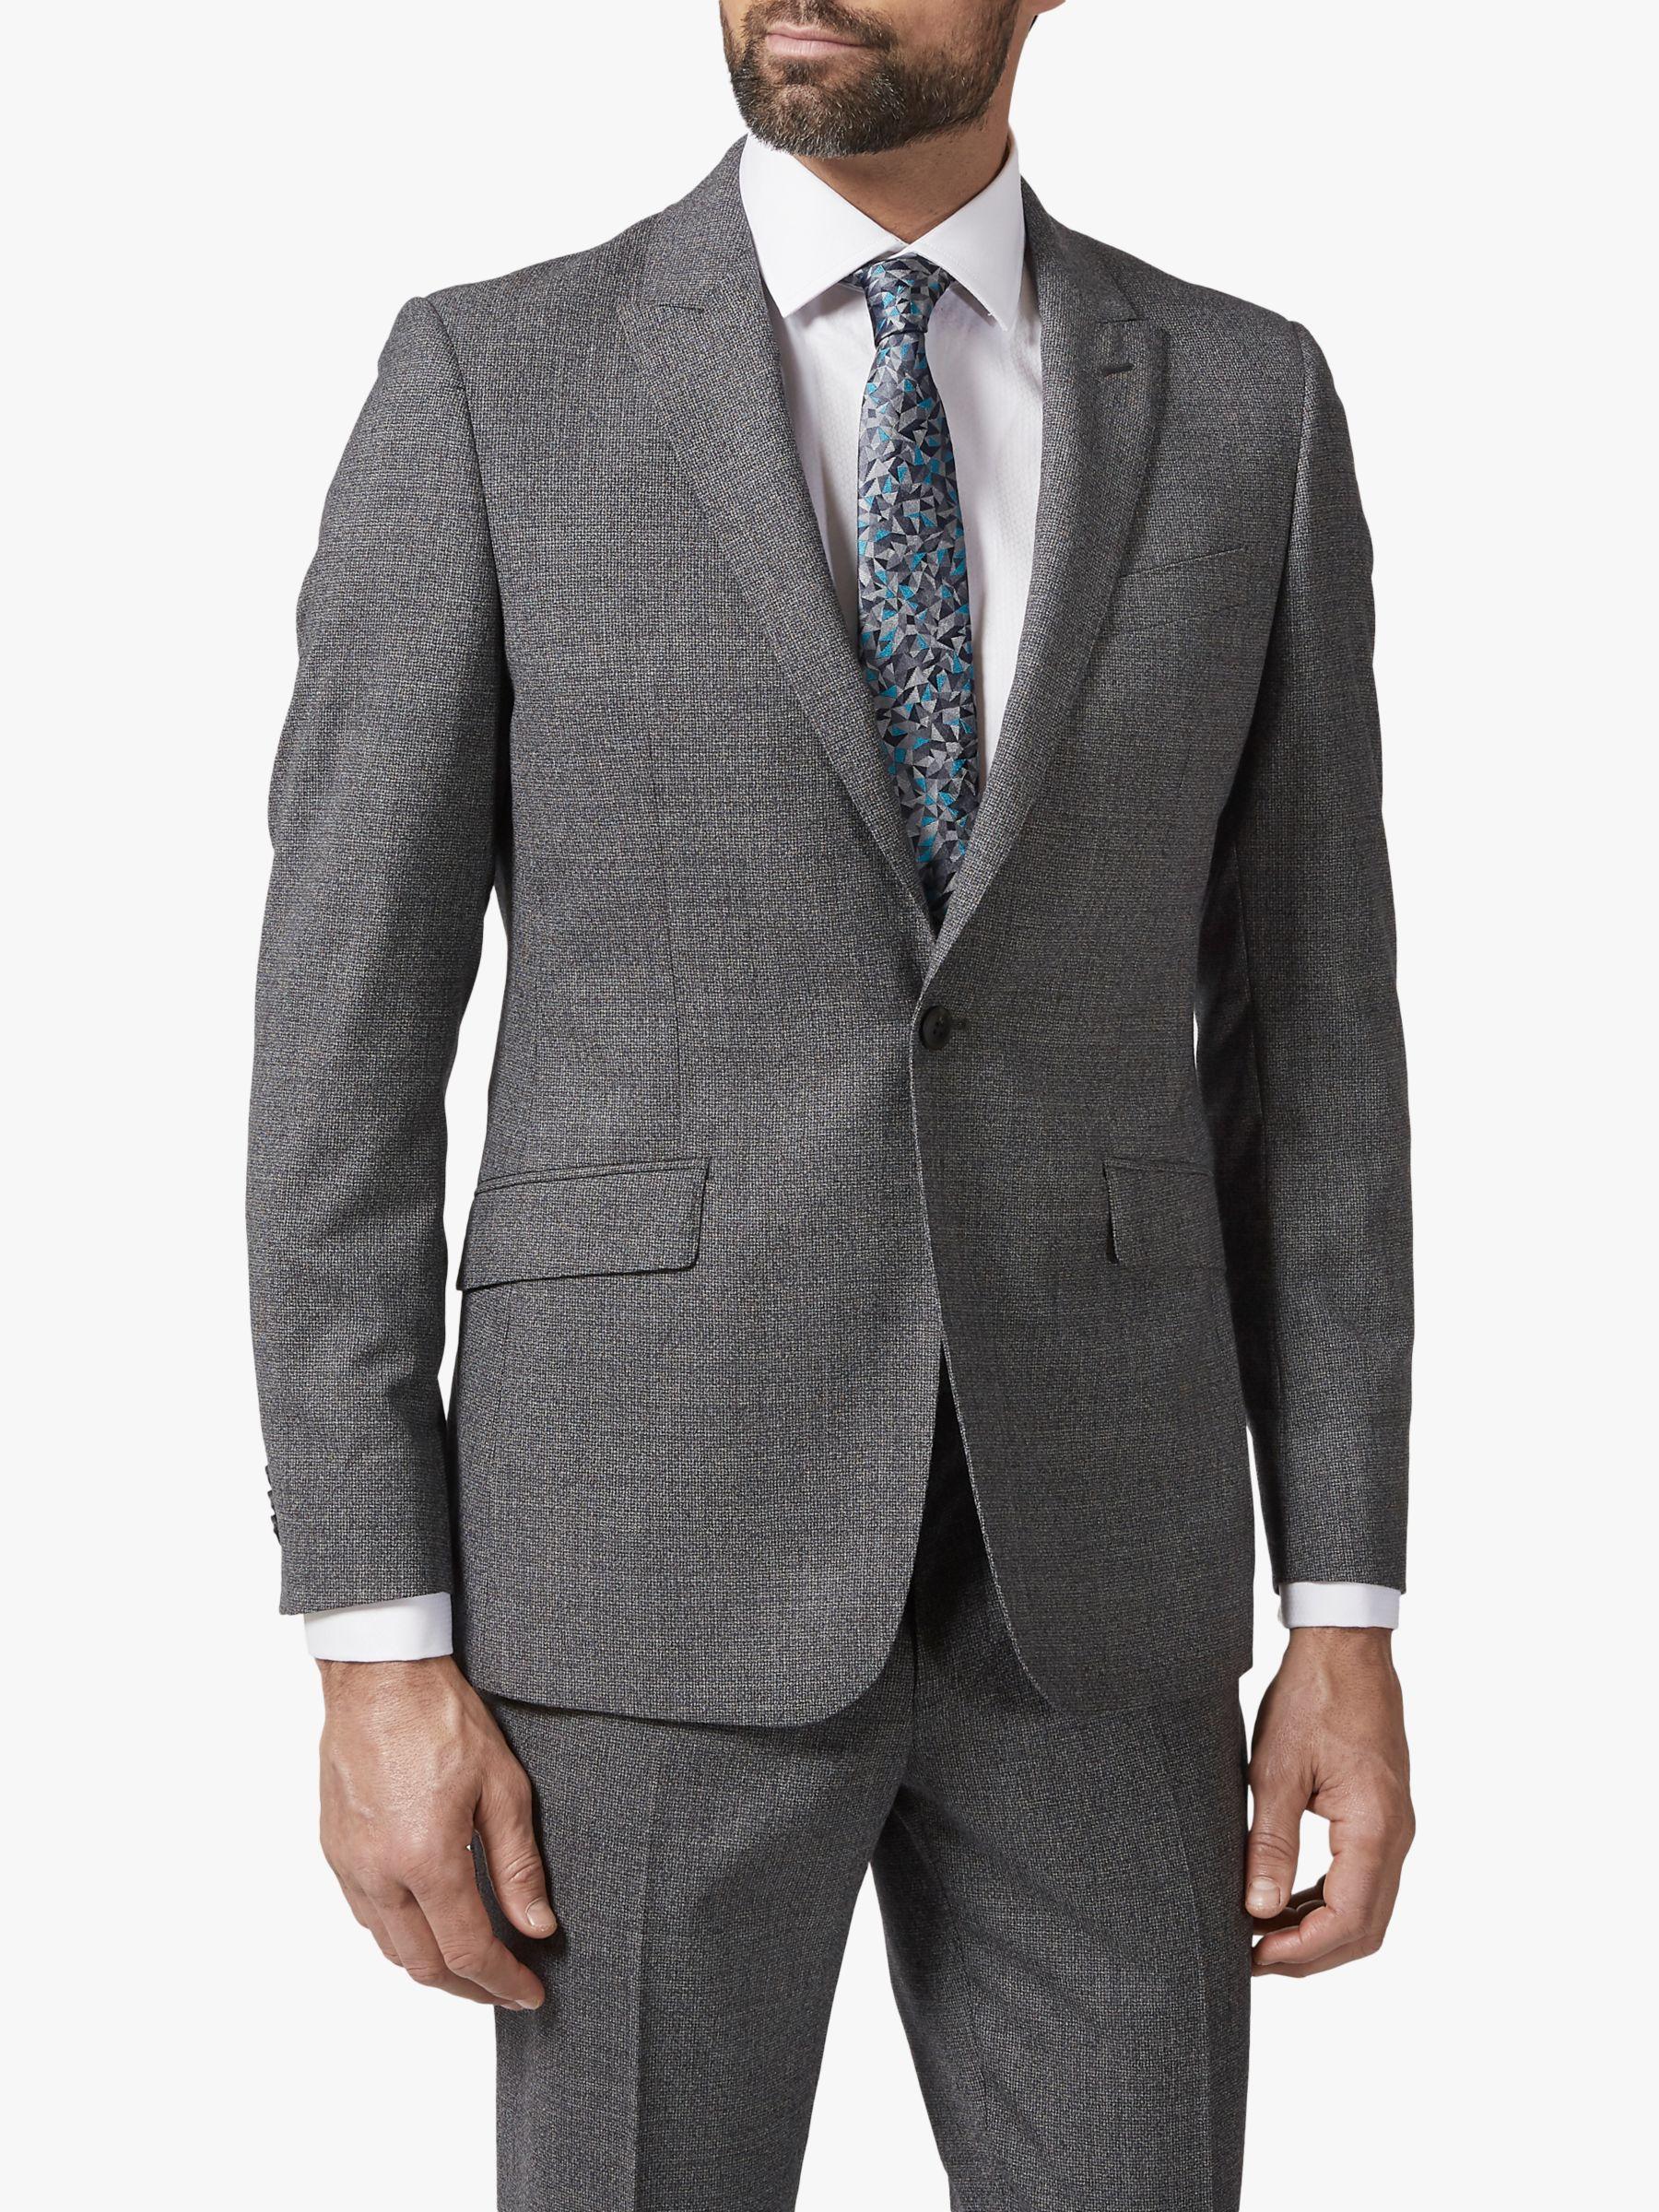 Richard James Mayfair Richard James Mayfair Single Button Melange Suit Jacket, Grey